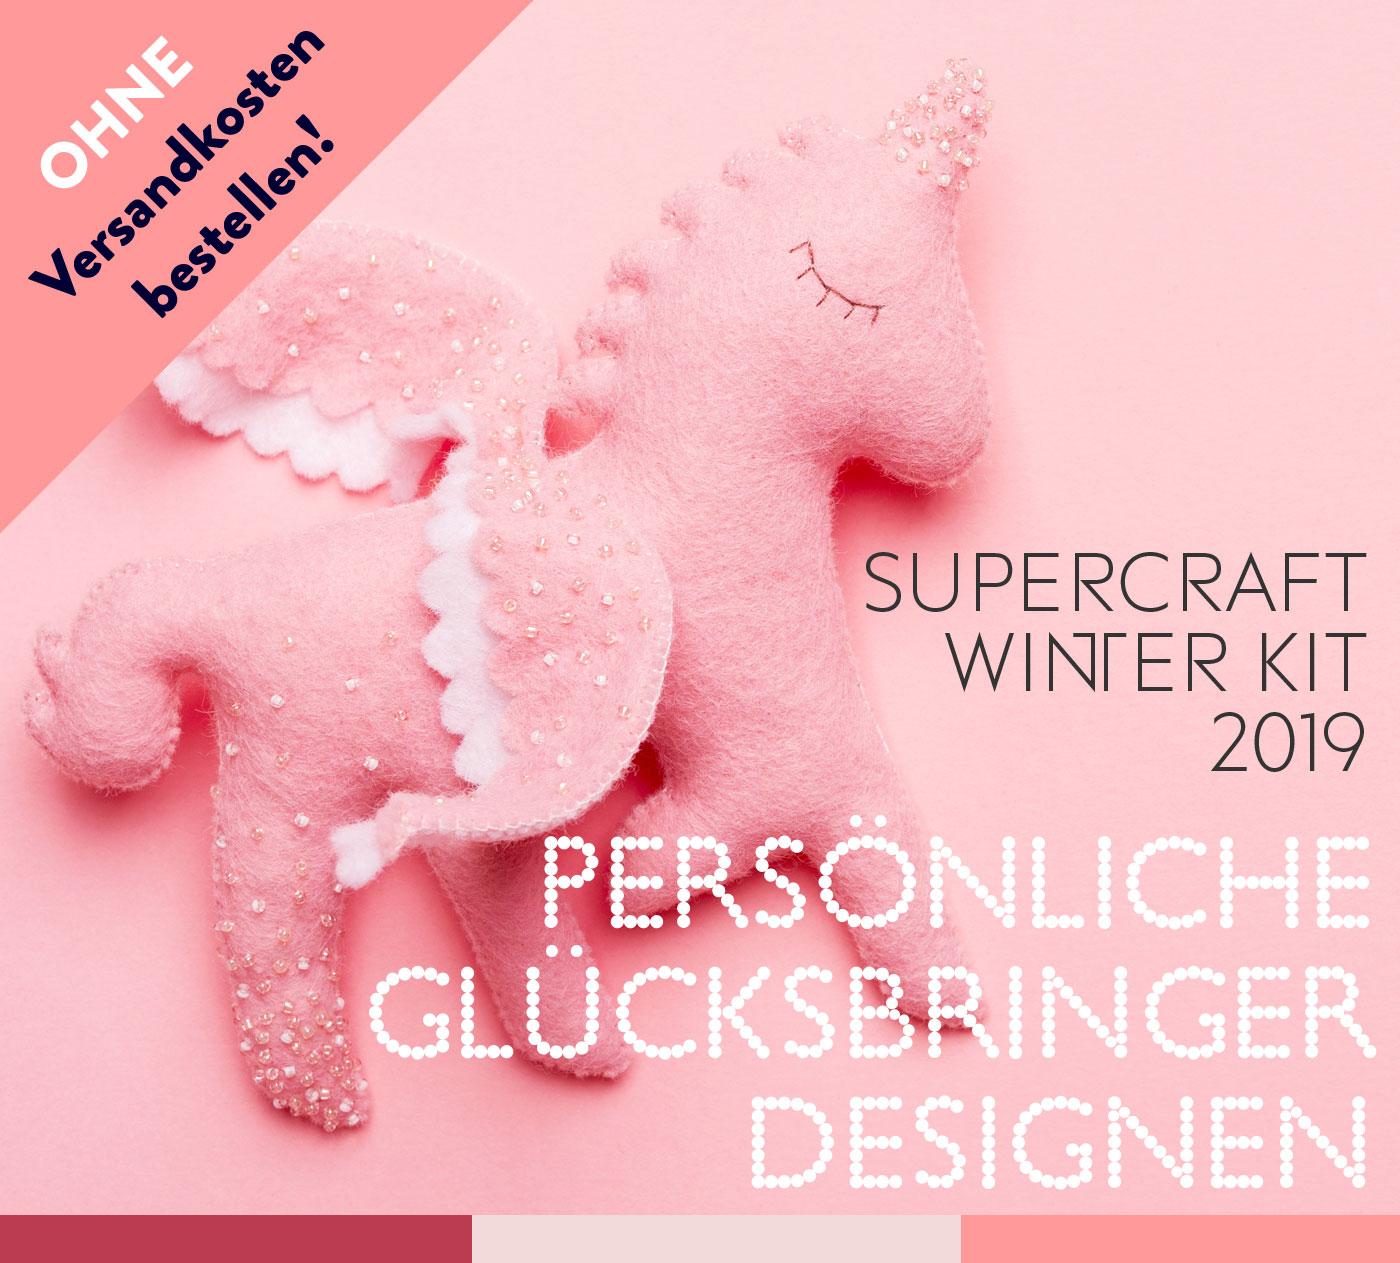 6 supercraft Kits für 24,95 Euro pro Kit